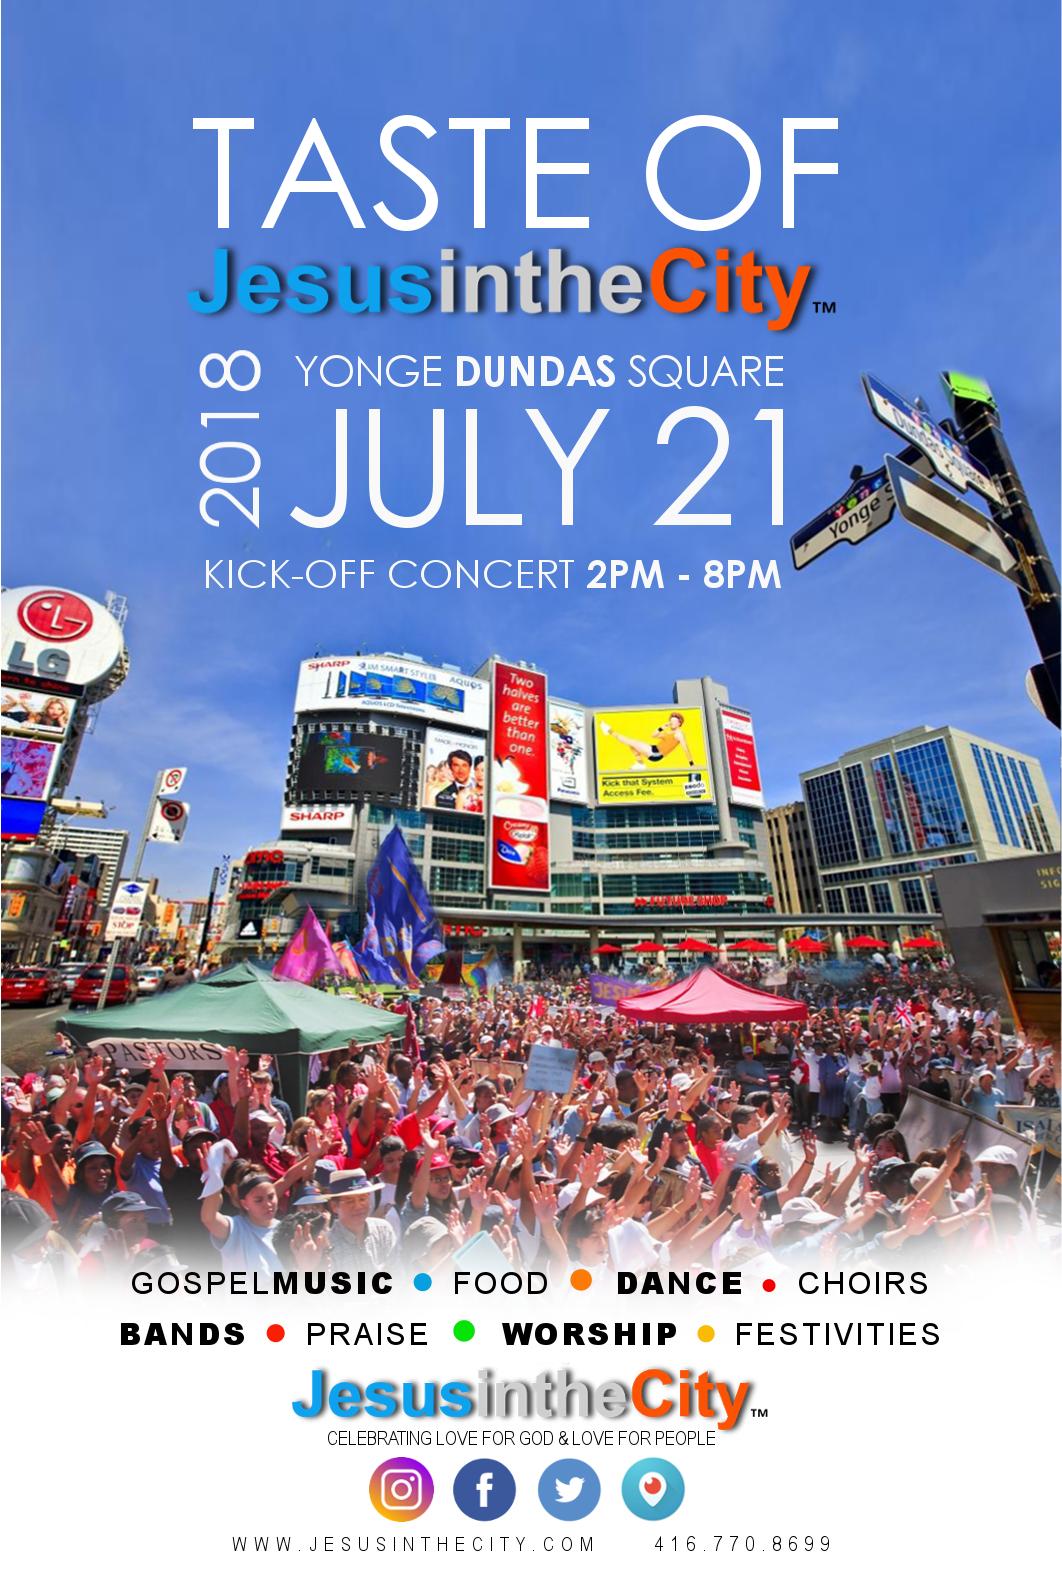 Jesus In The City Festival – July 21, 2018